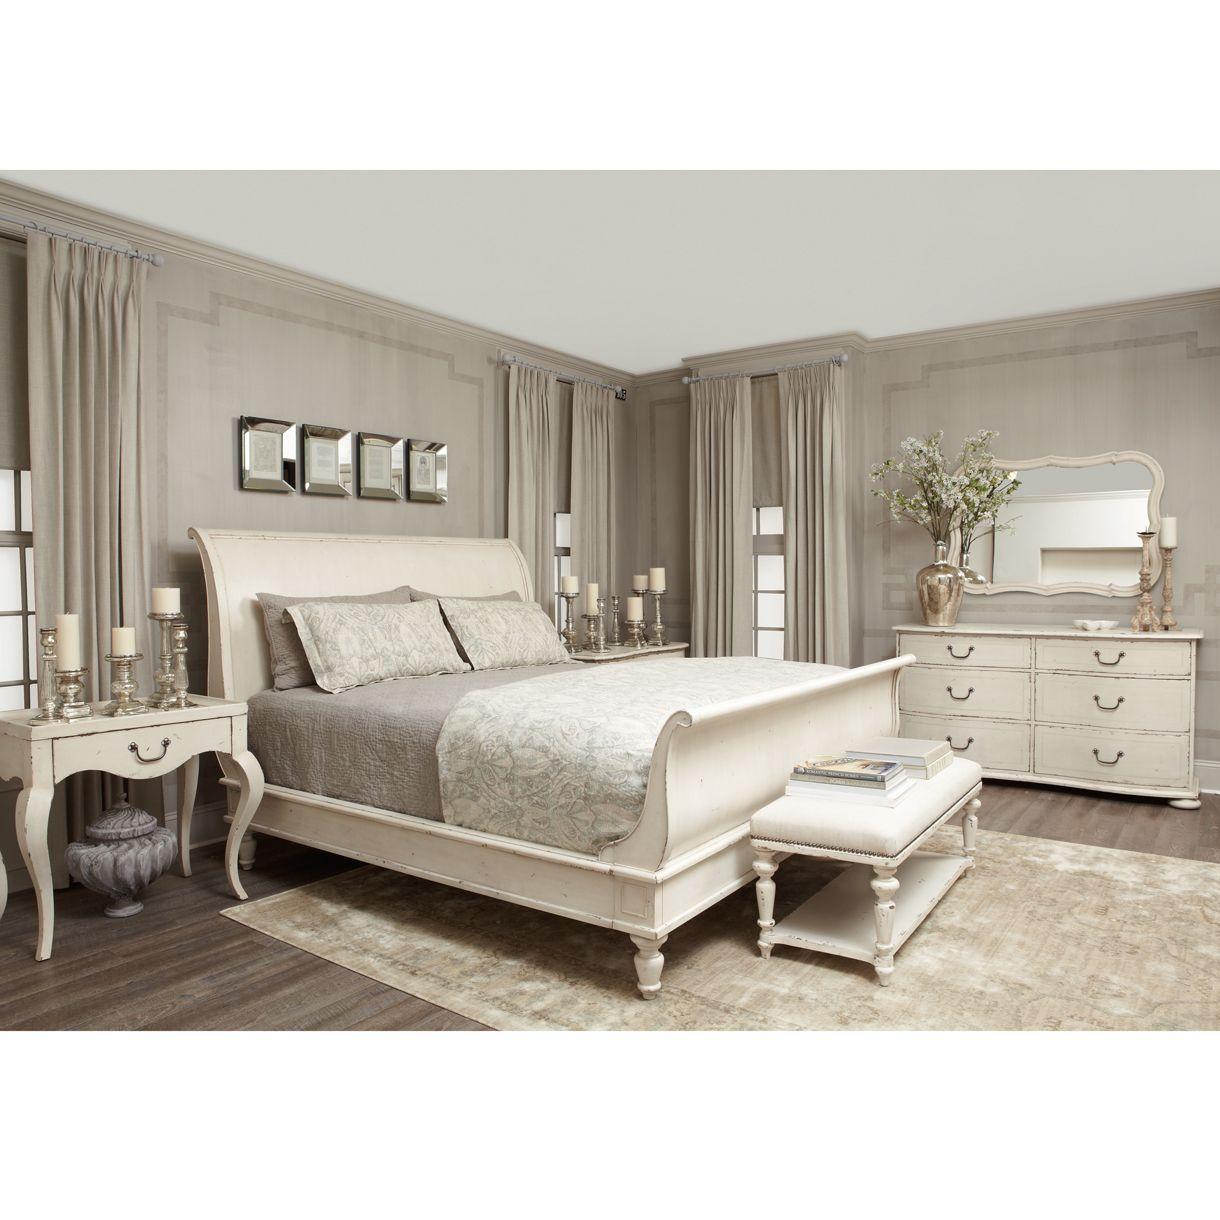 Reine French Country Antique White Queen Sleigh Bed Bedroom Furniture Sets Bedroom Design Elegant Bedroom